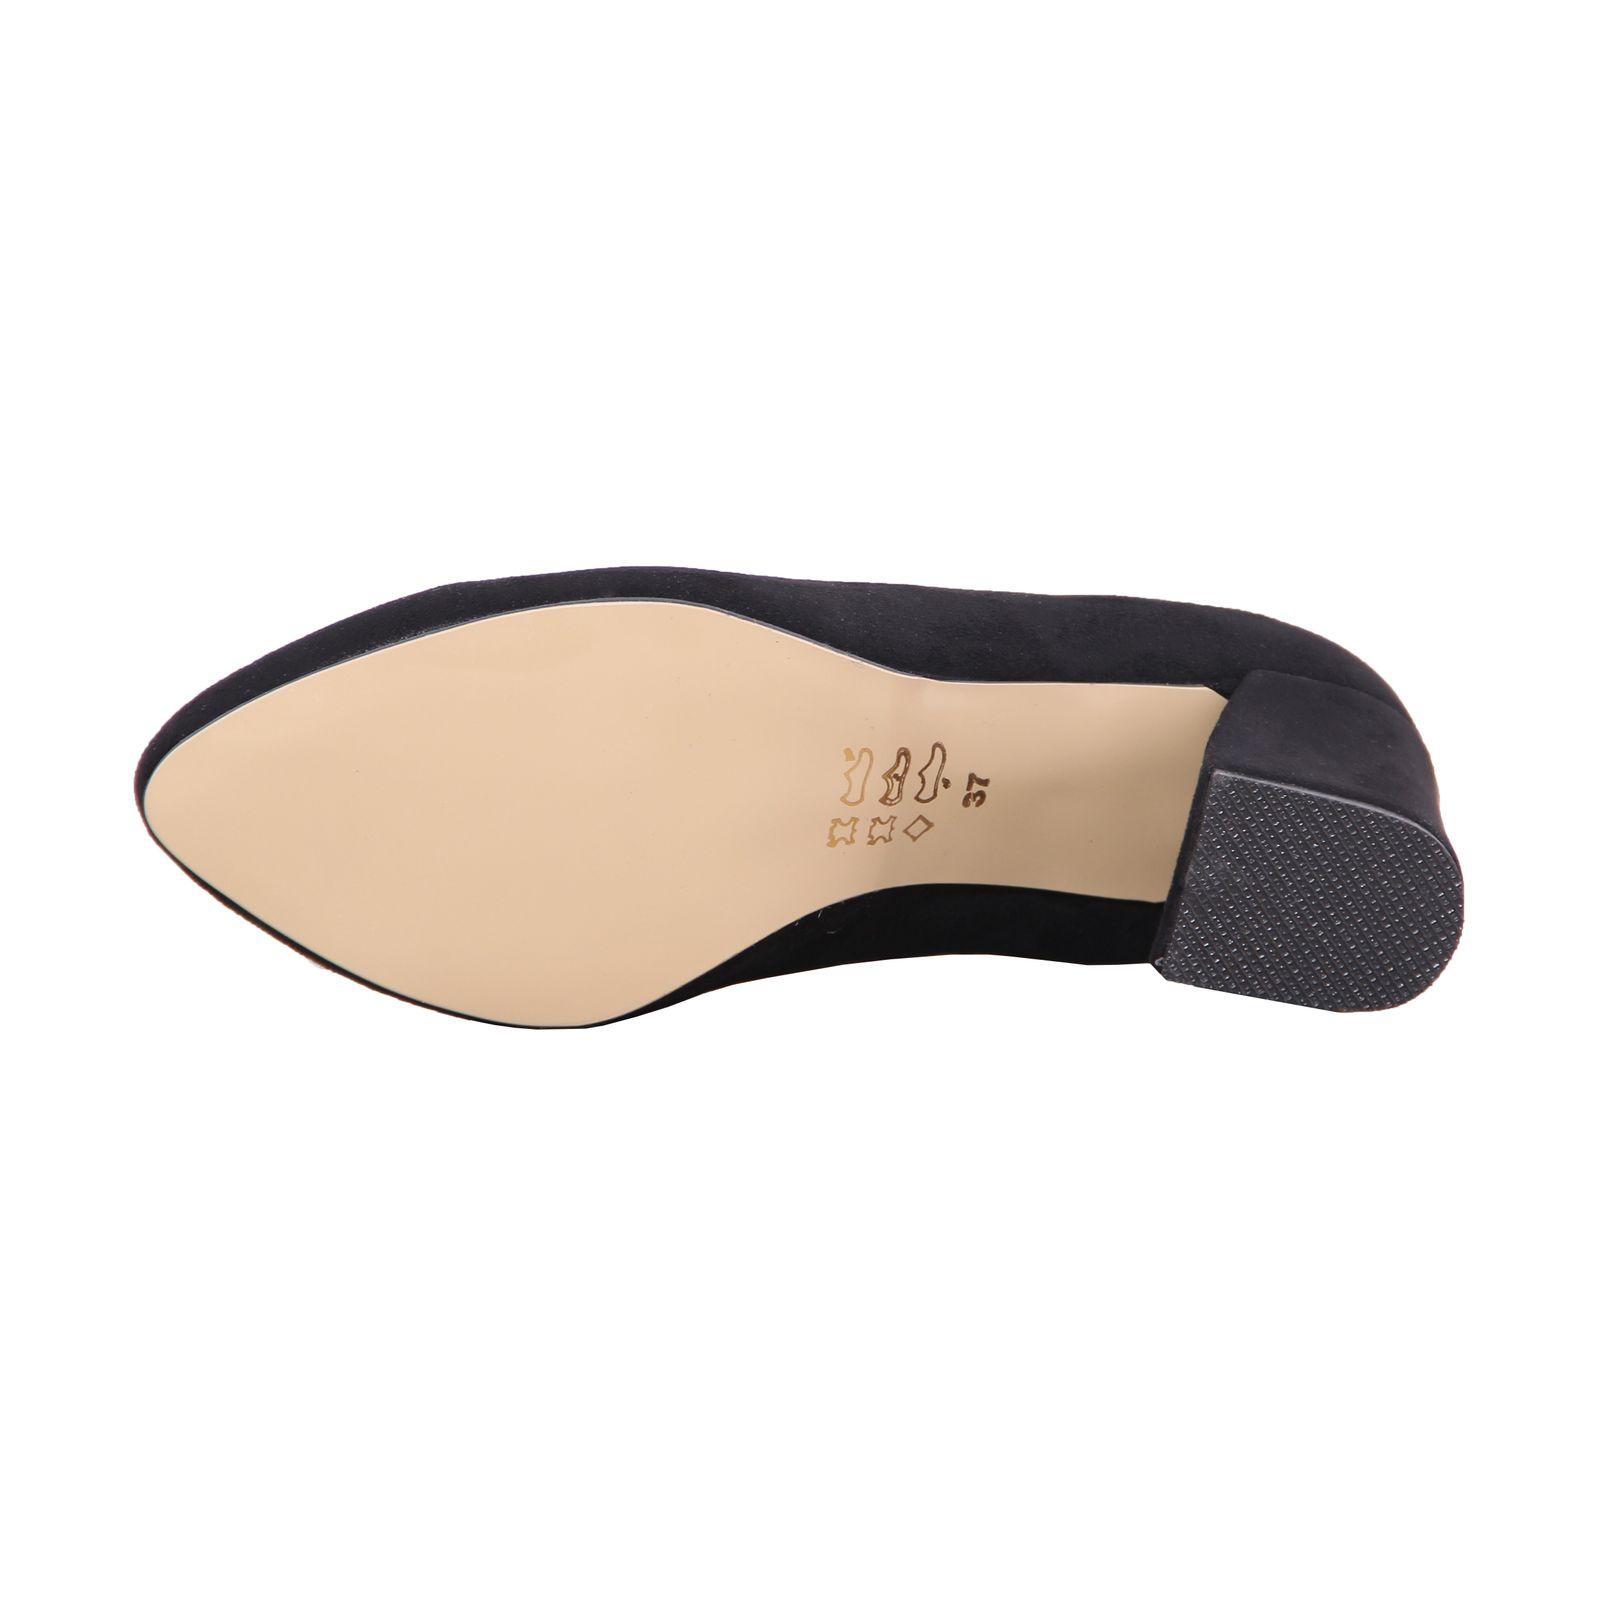 کفش زنانه کد 1-39953  main 1 3